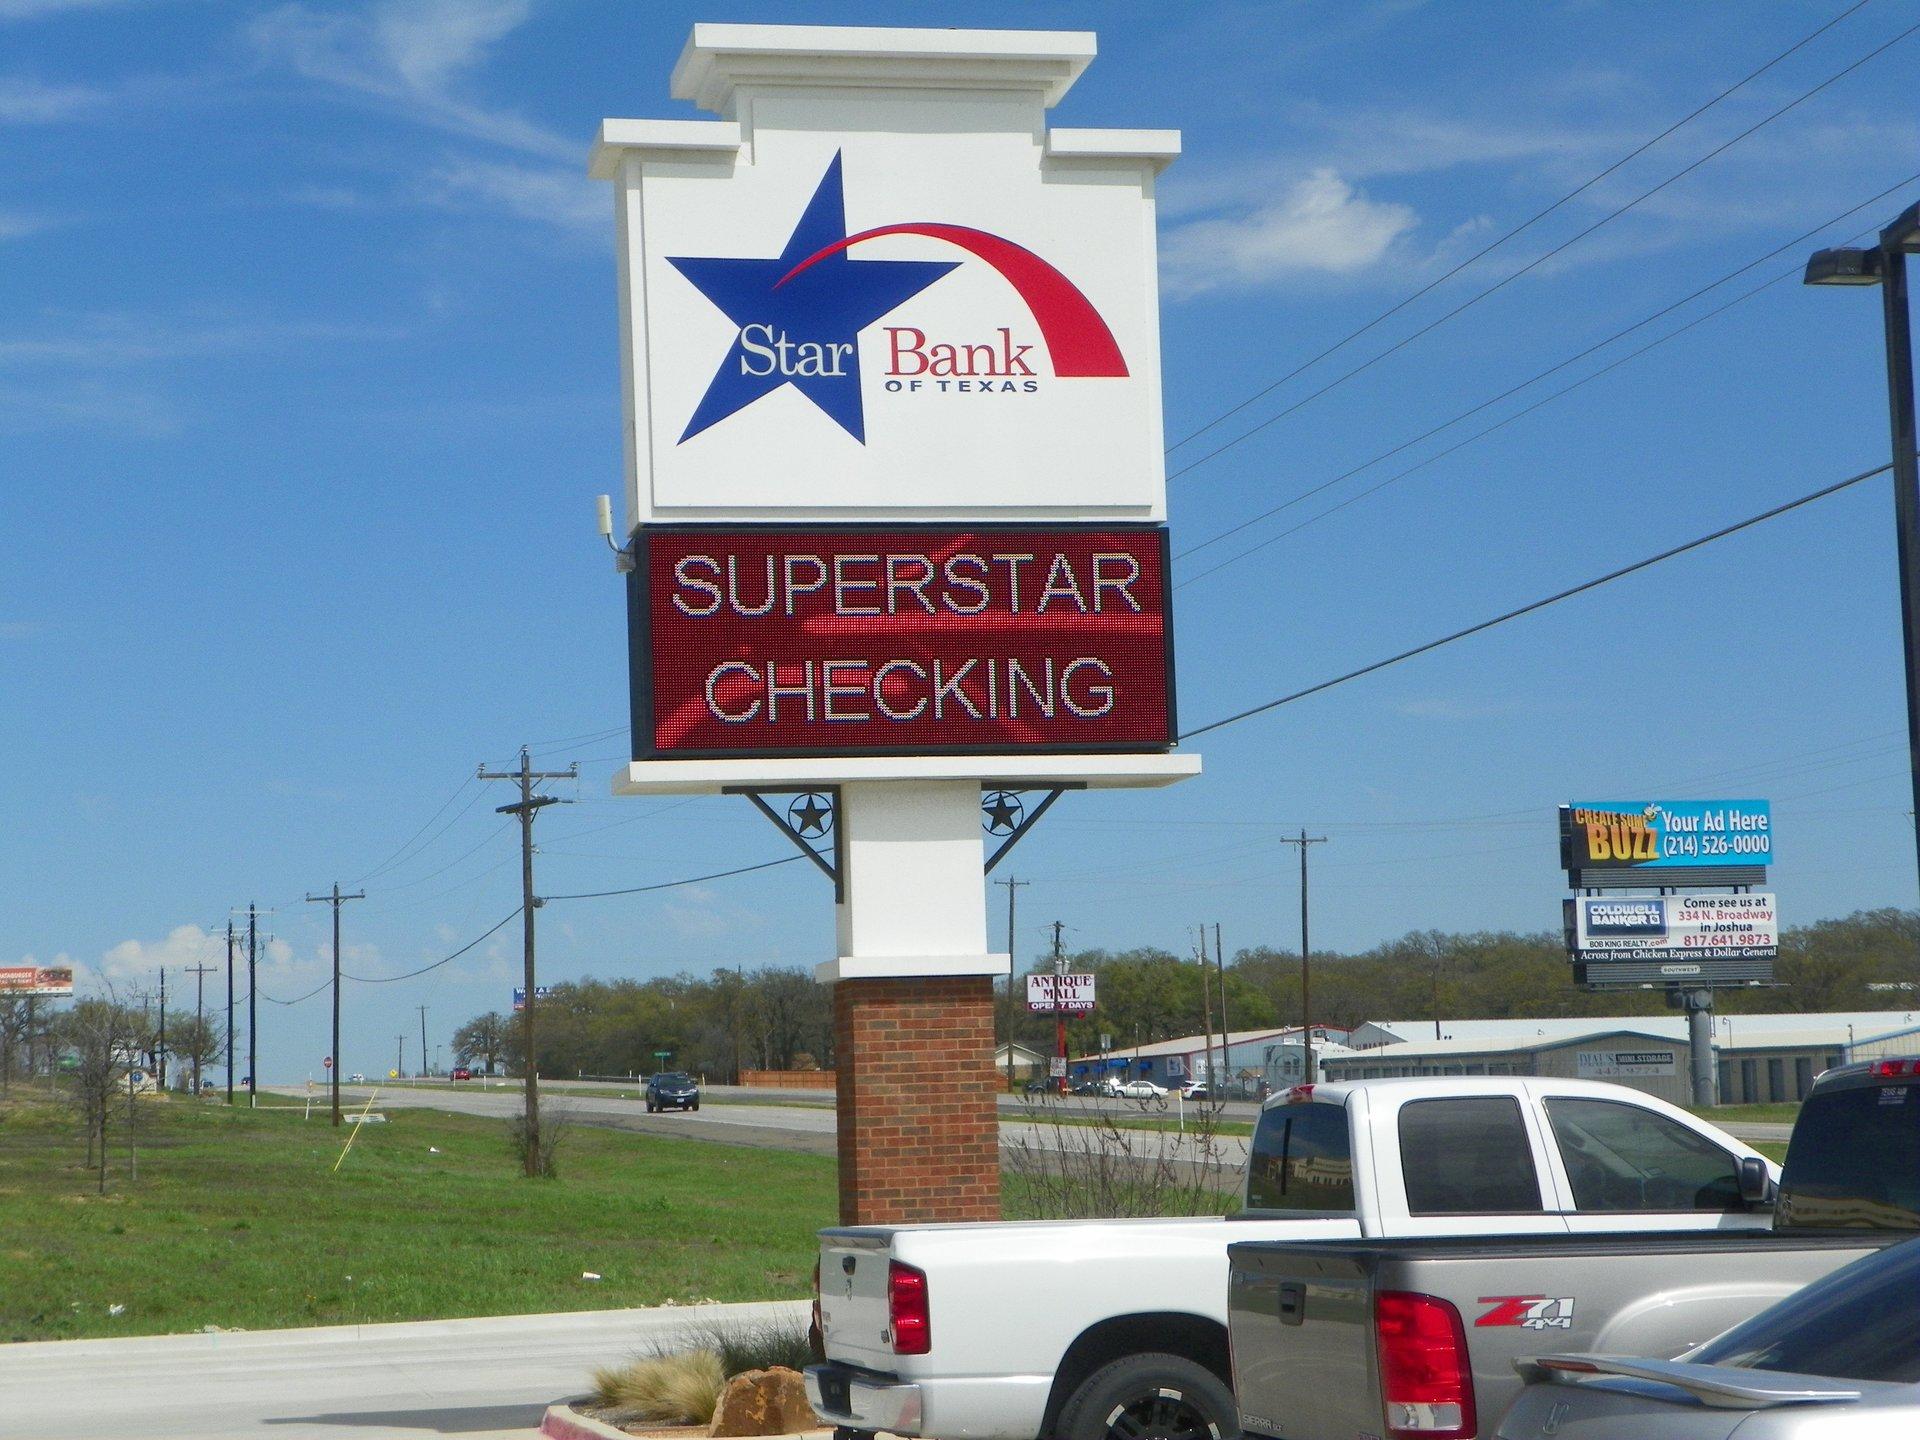 star bank sign